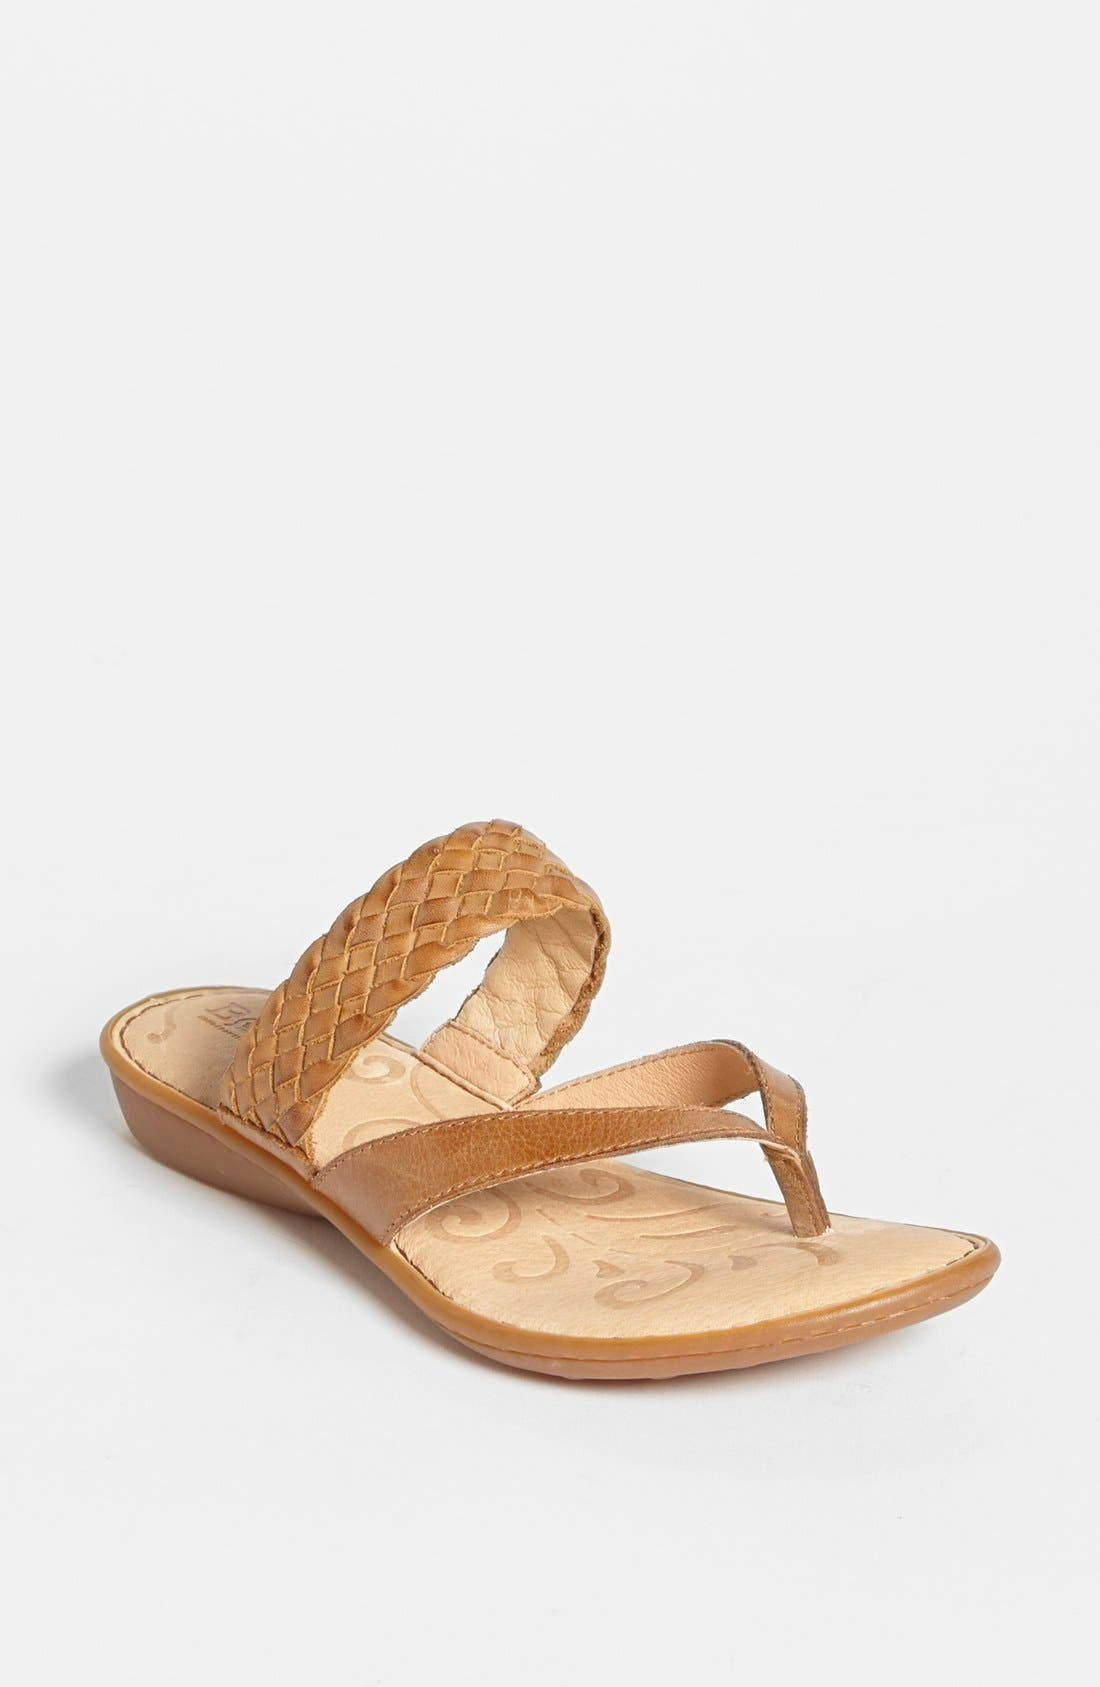 Main Image - Børn 'Joya' Sandal (Special Purchase)